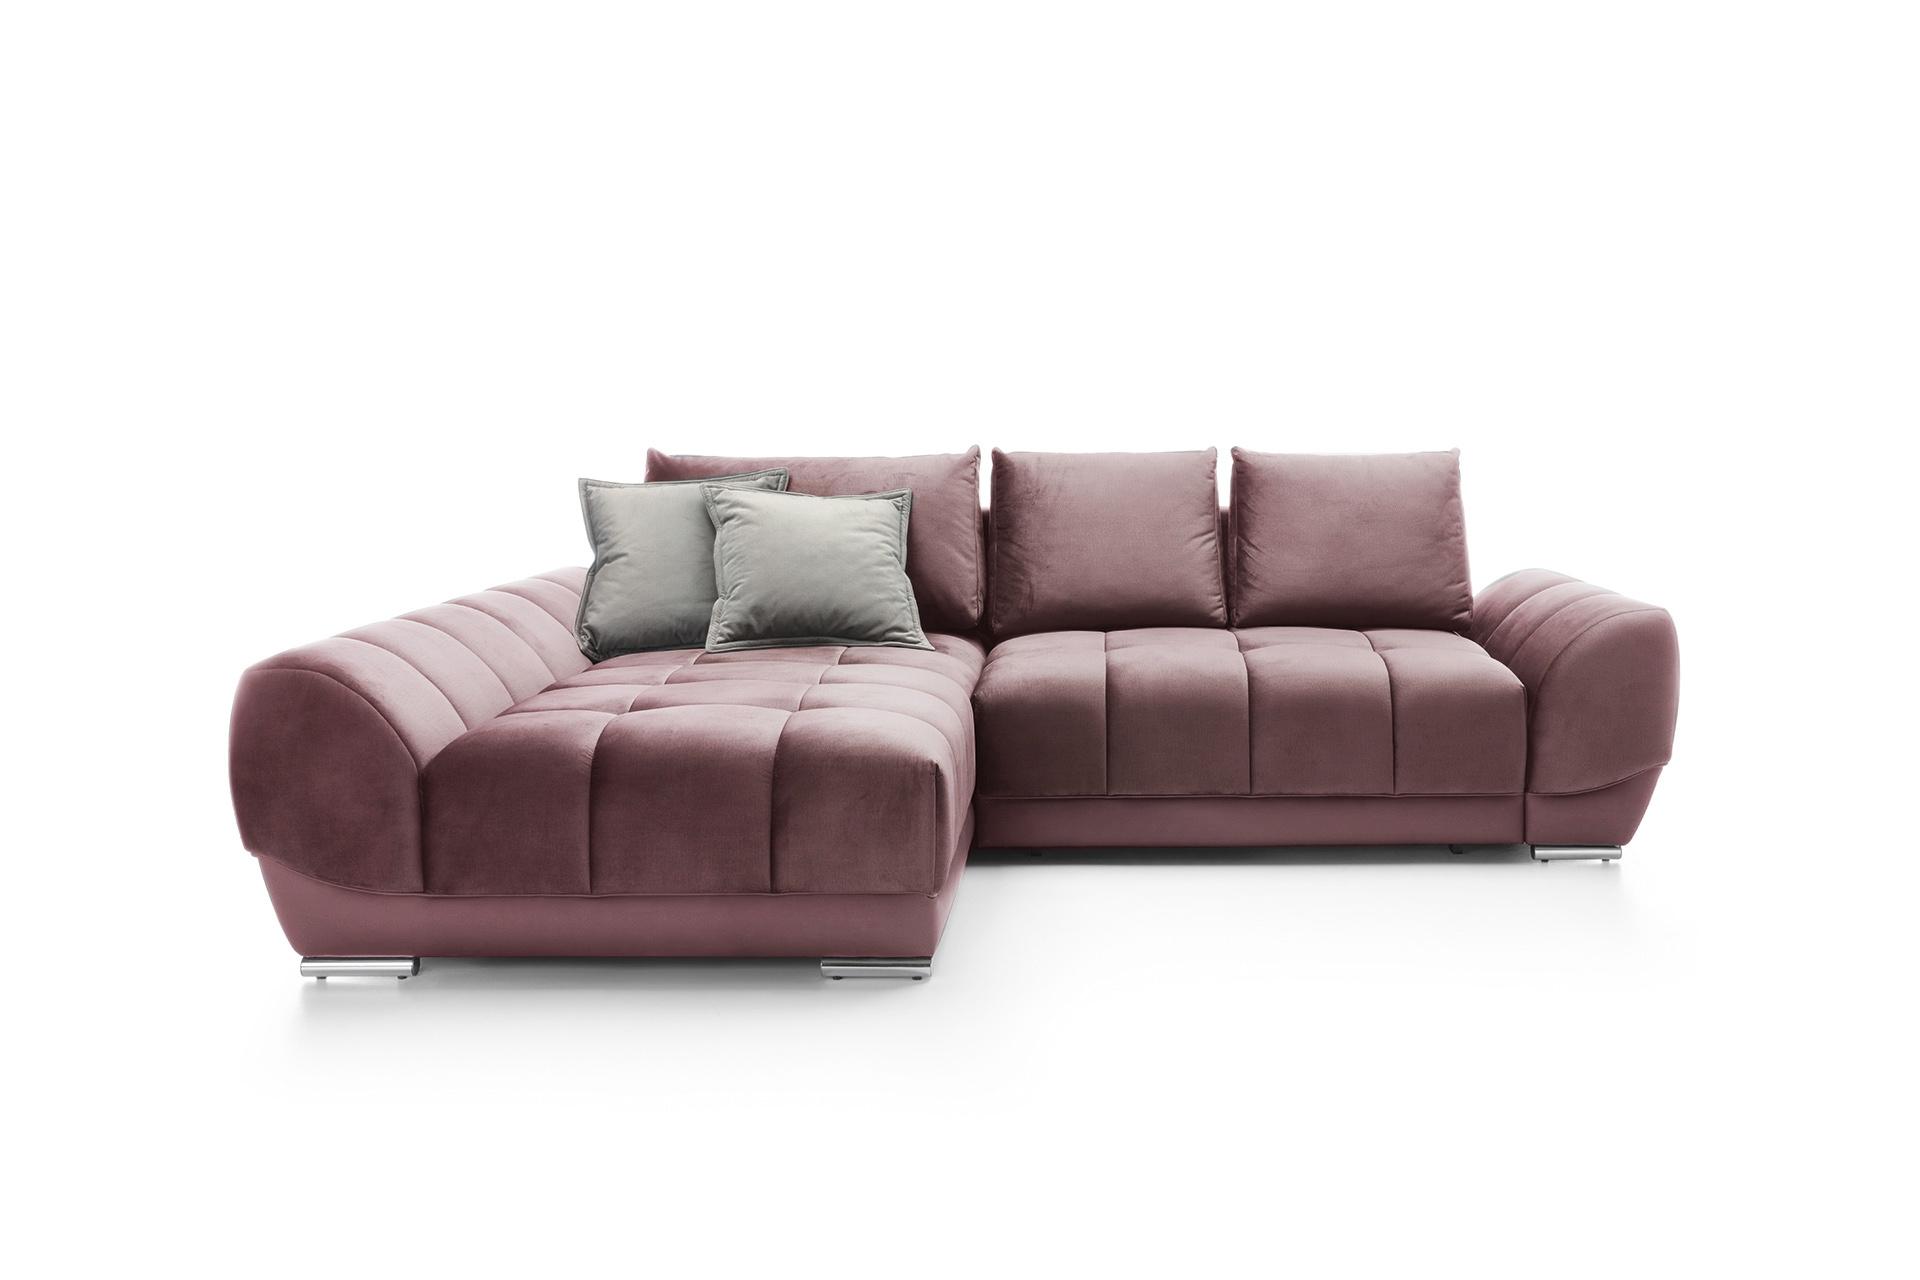 Coltar Extensibil Lada Depozitare Sezlong Stanga Violet Dark Pink